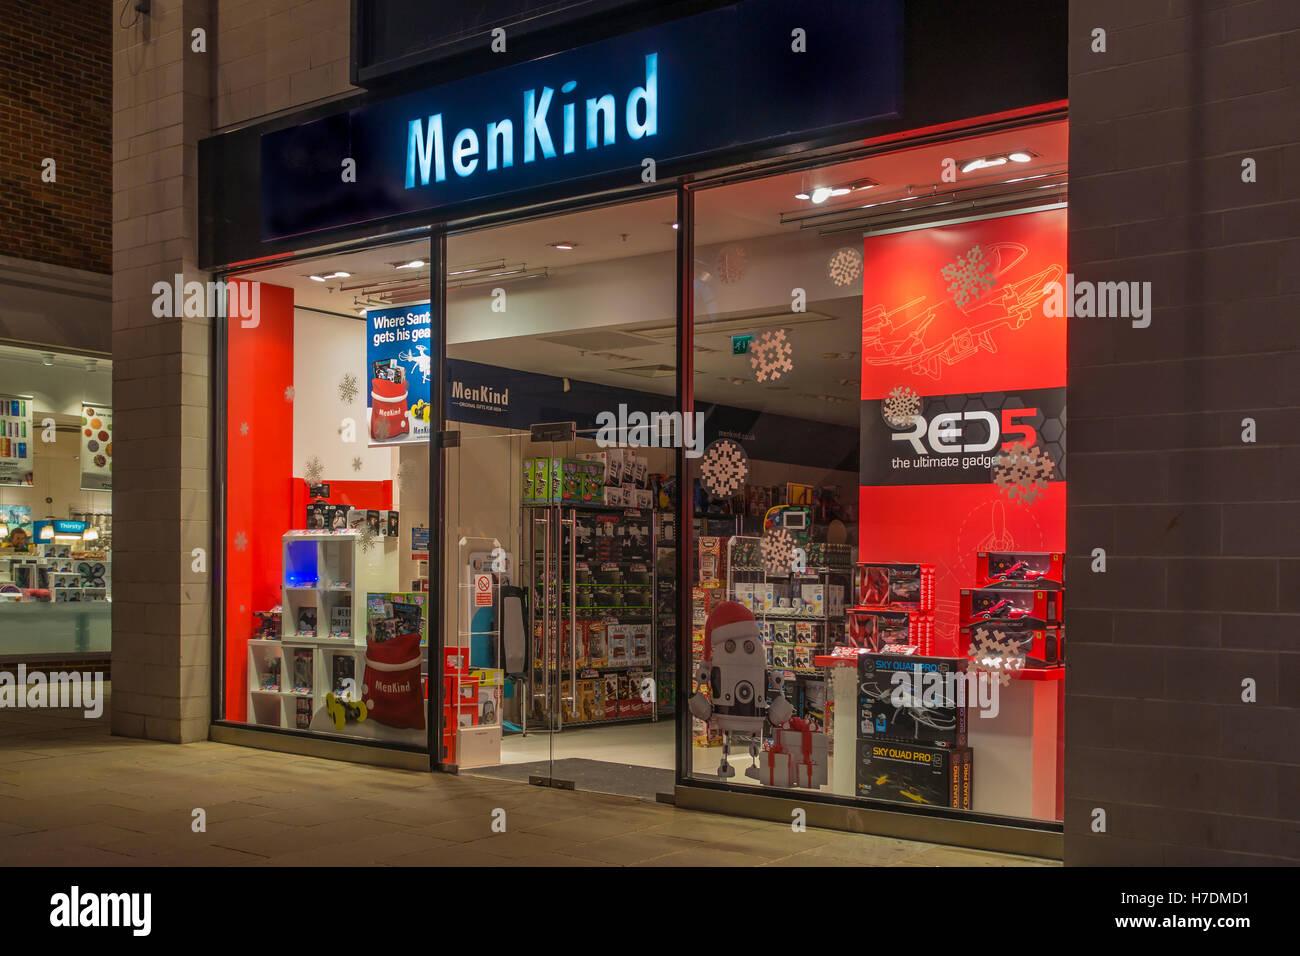 MenKind Gadget Store Whitefriars Shopping Centre Canterbury Kent UK Night Time - Stock Image